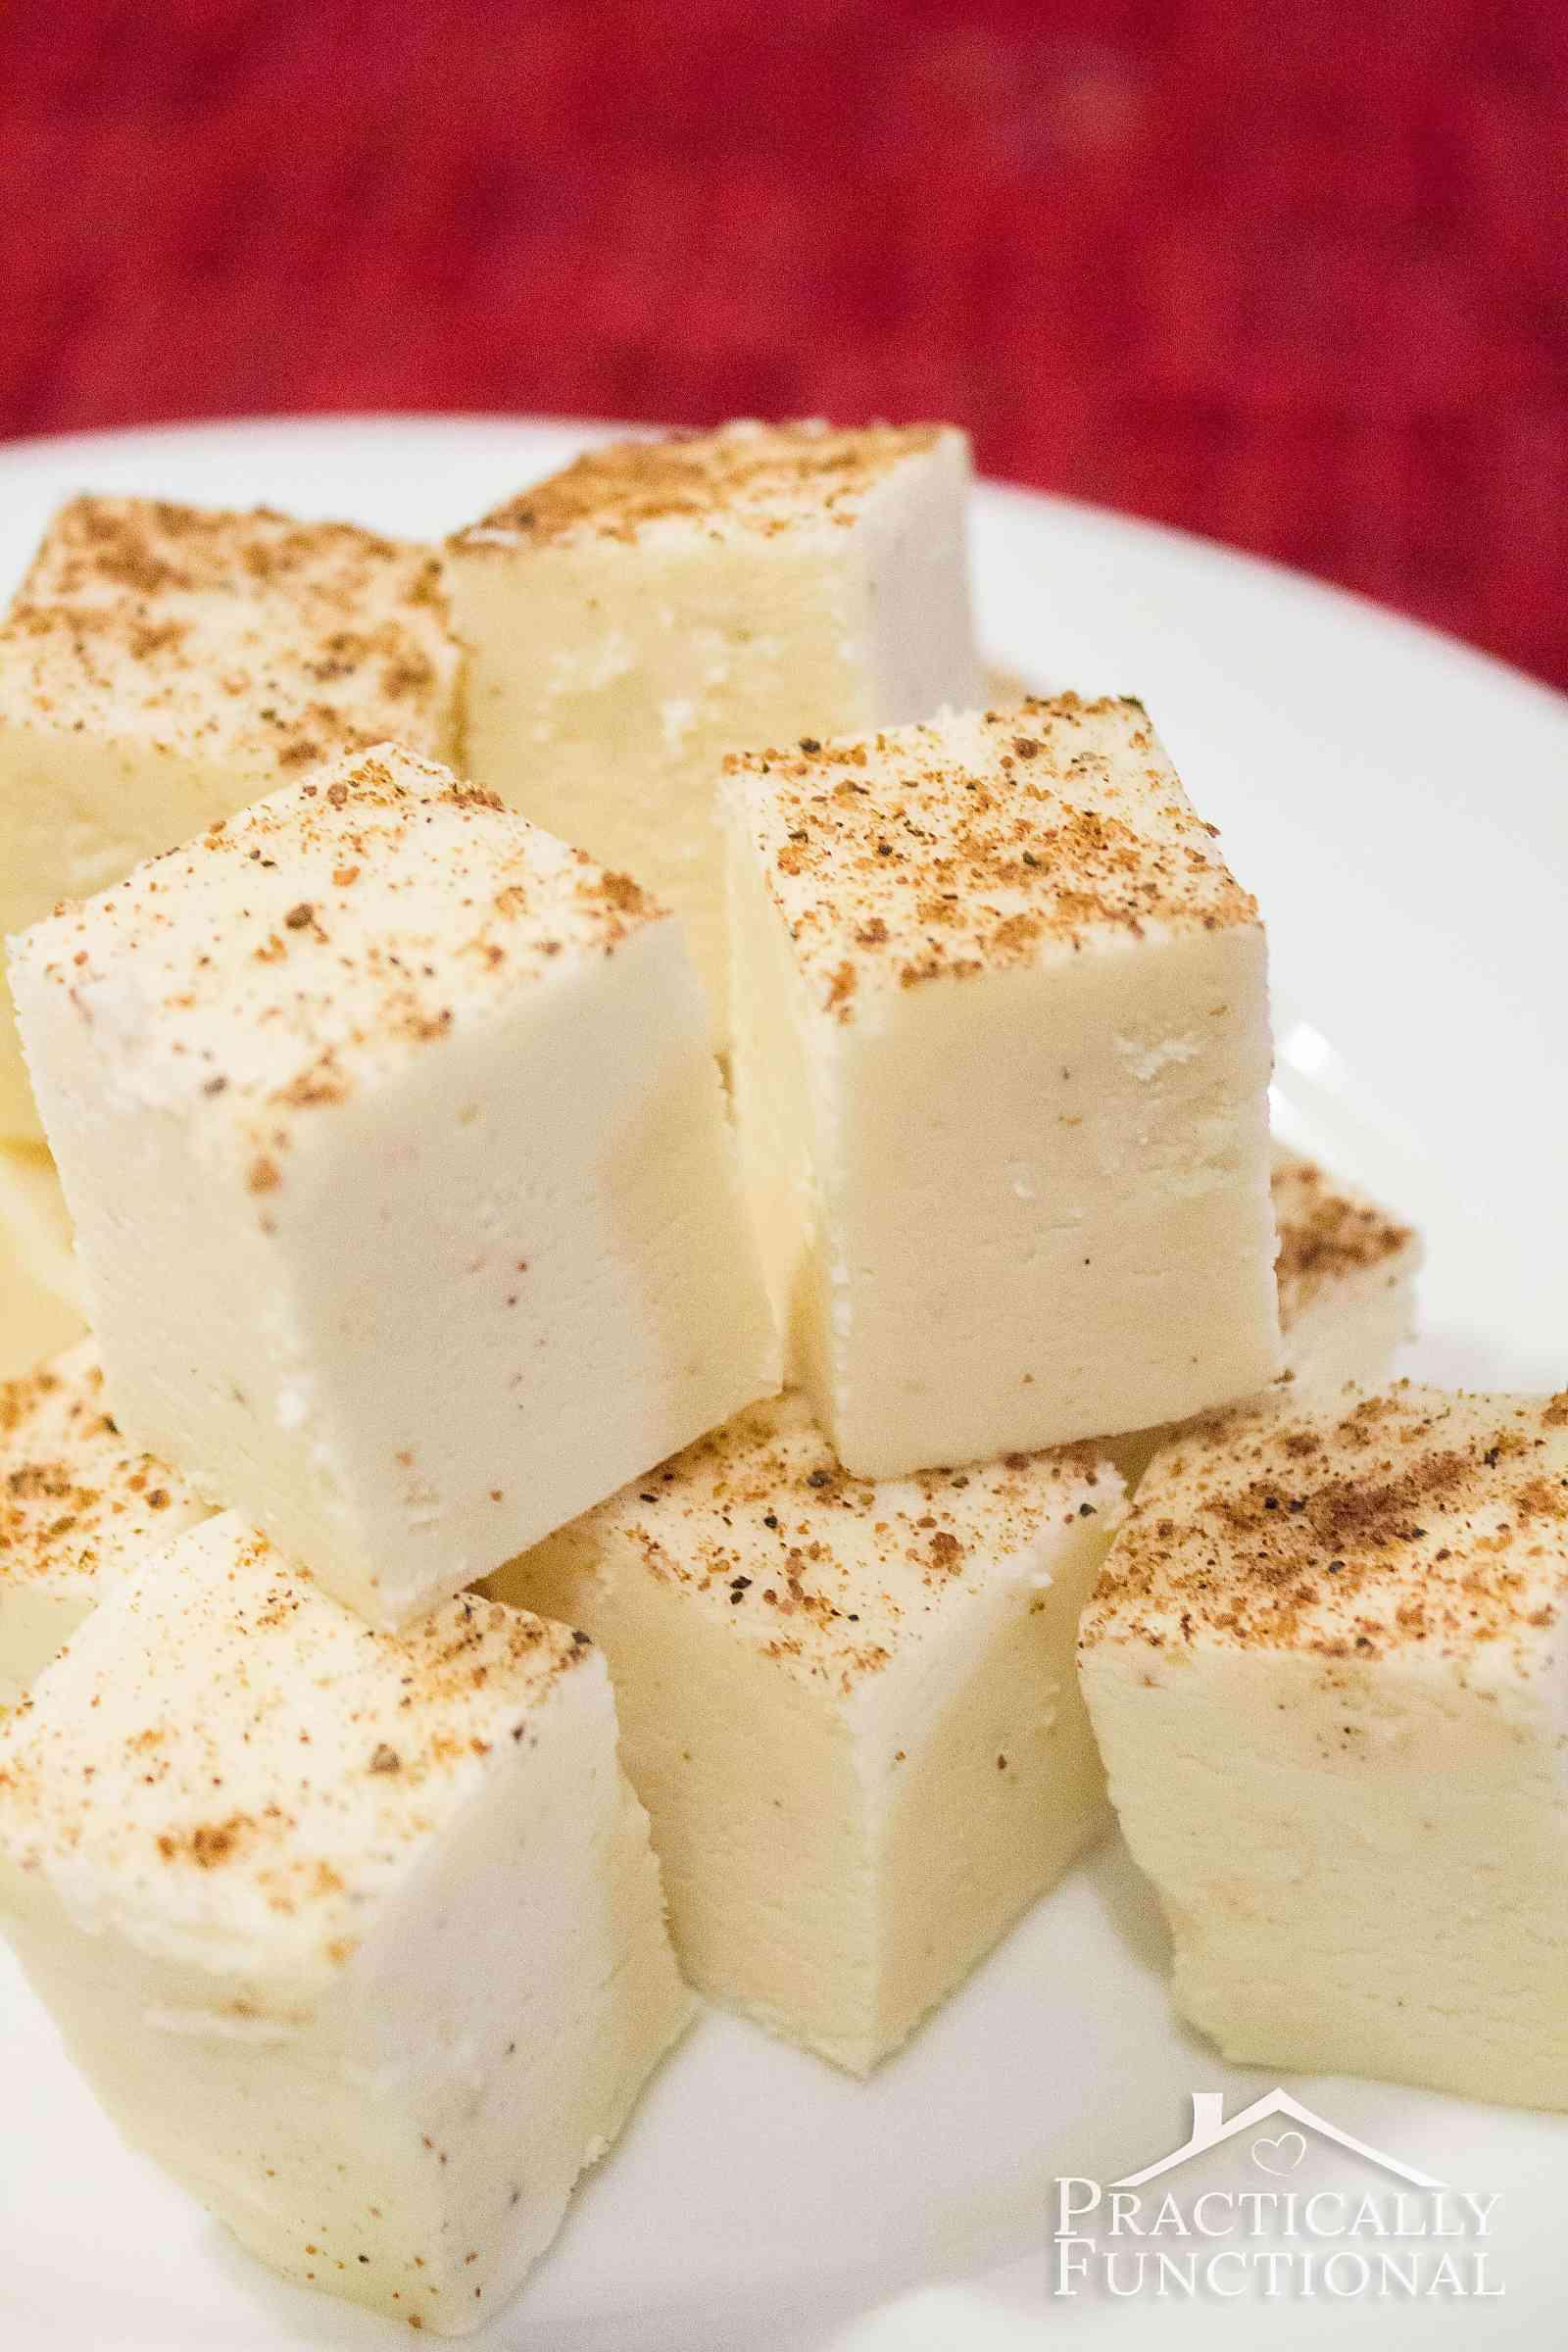 White Chocolate Eggnog Fudge